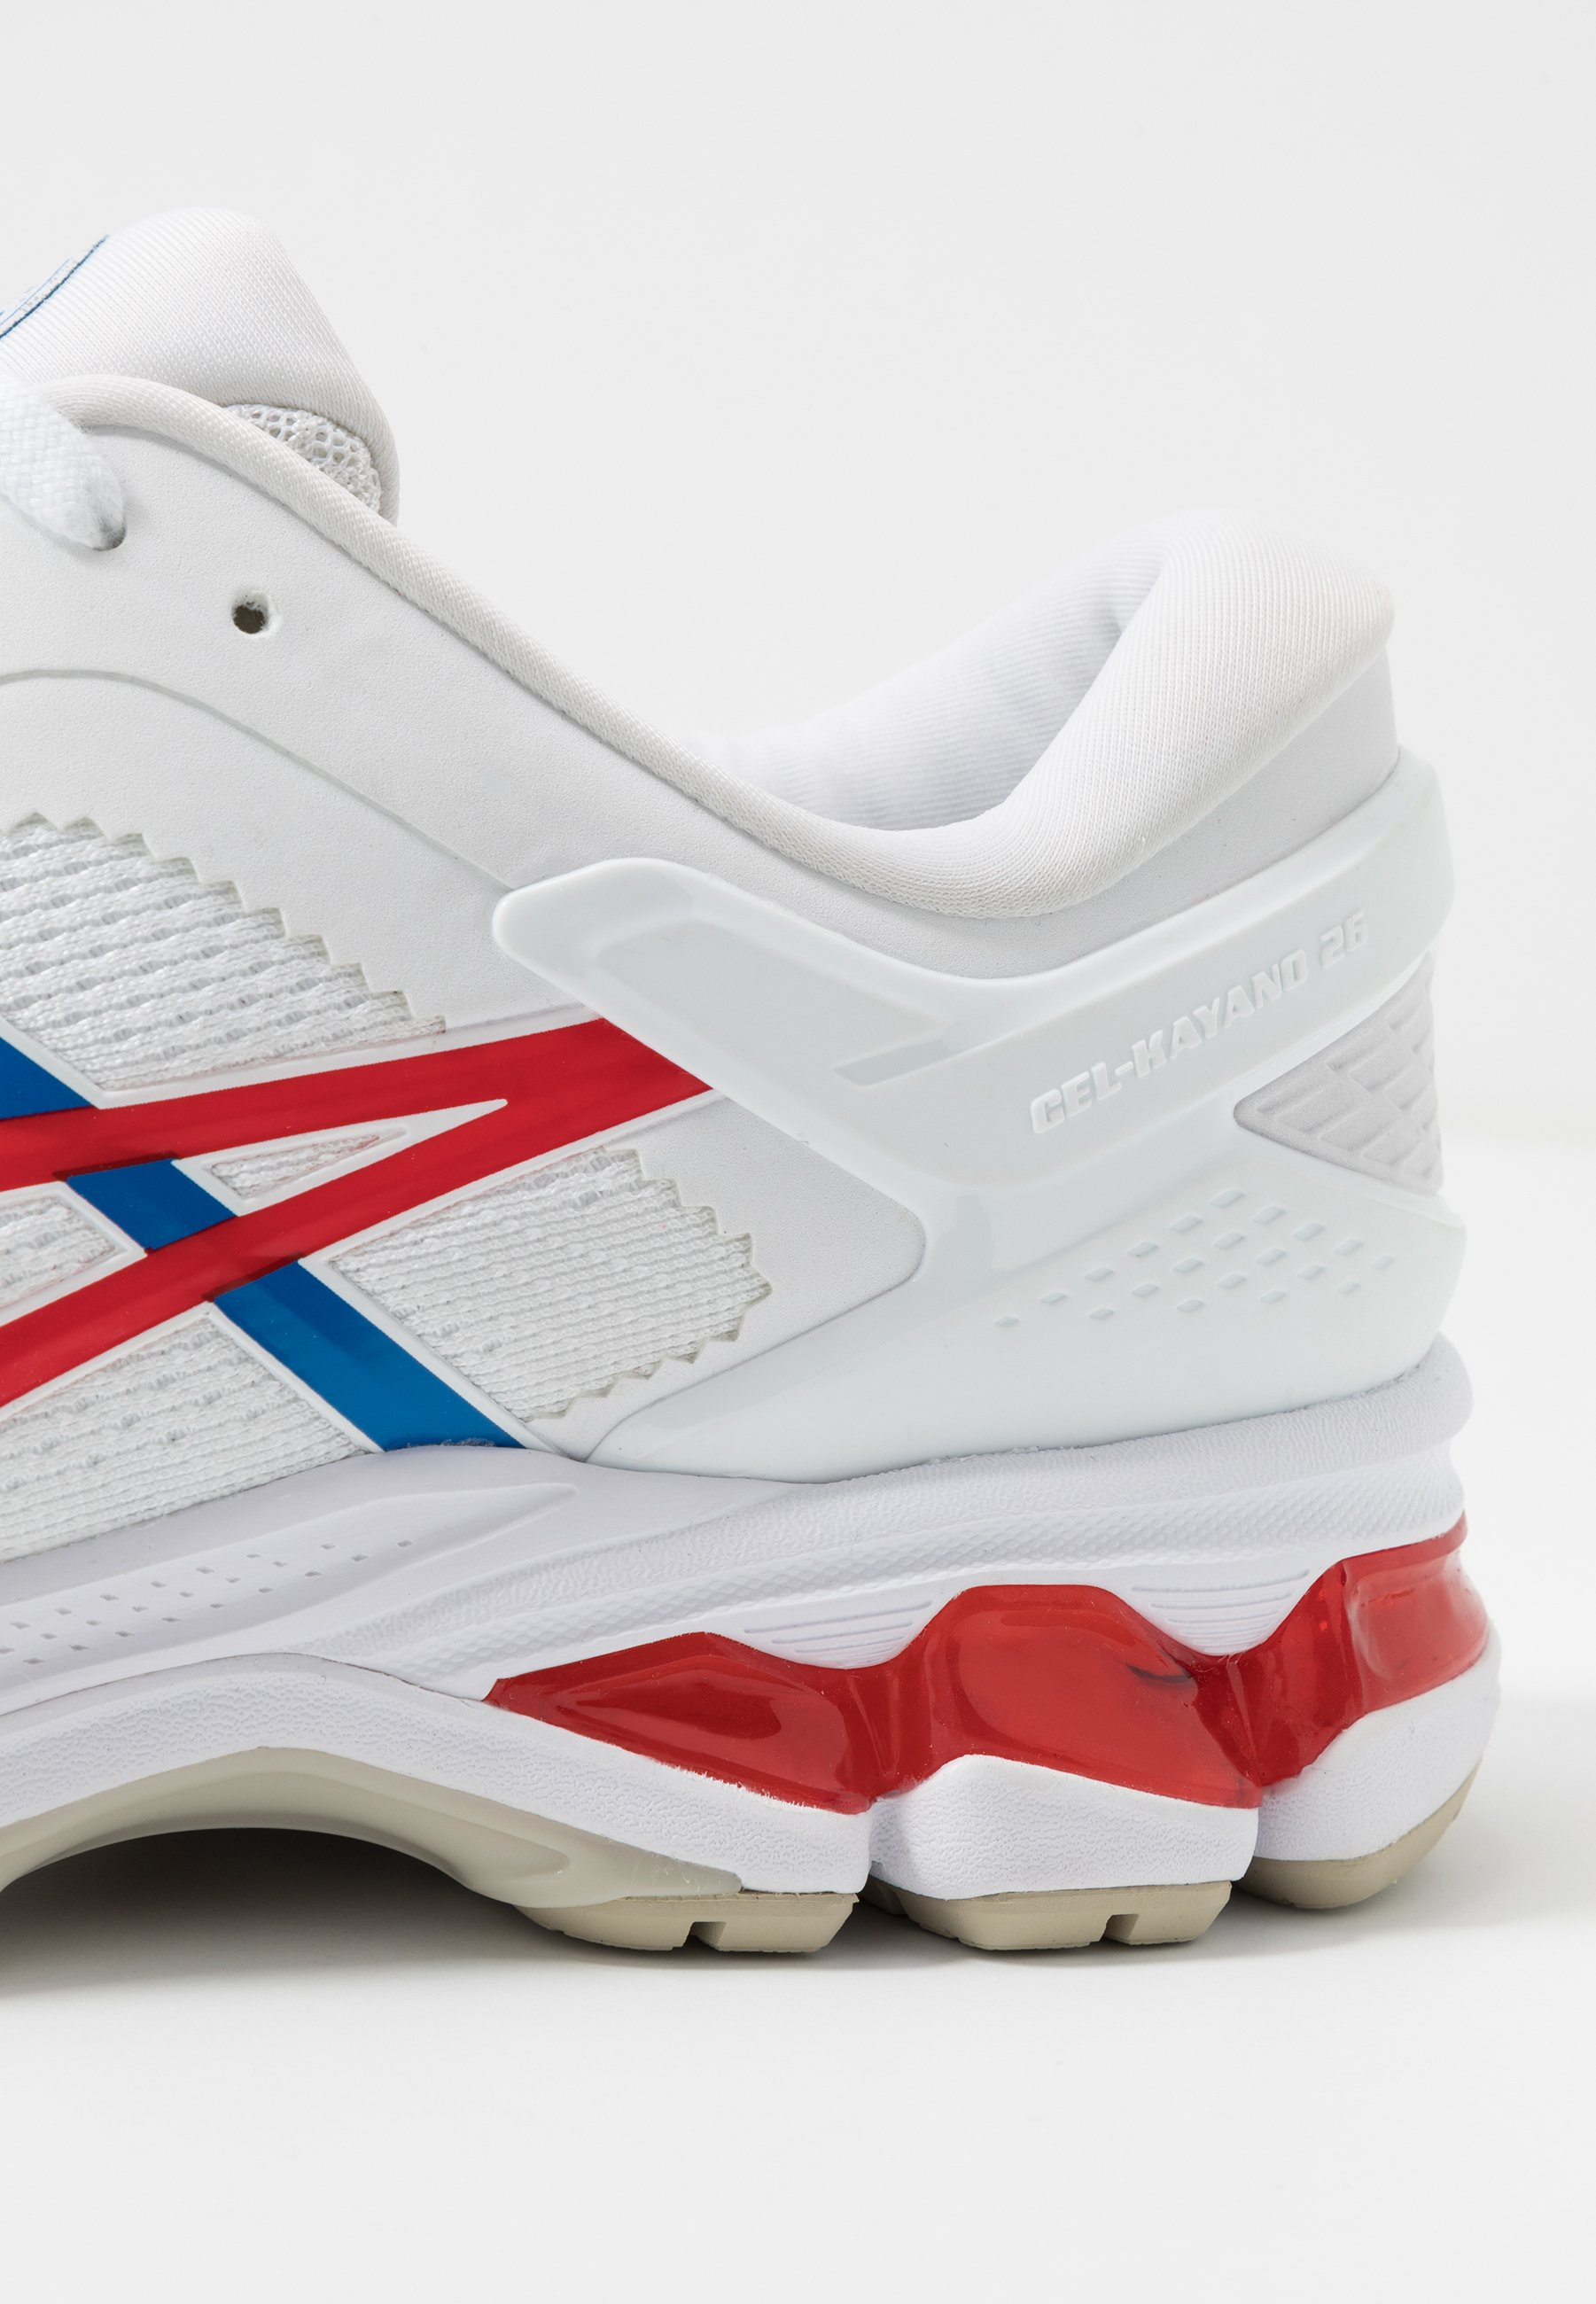 Asics Gel-kayano 26 - Retro Tokyo Stabile Løpesko White/classic Red